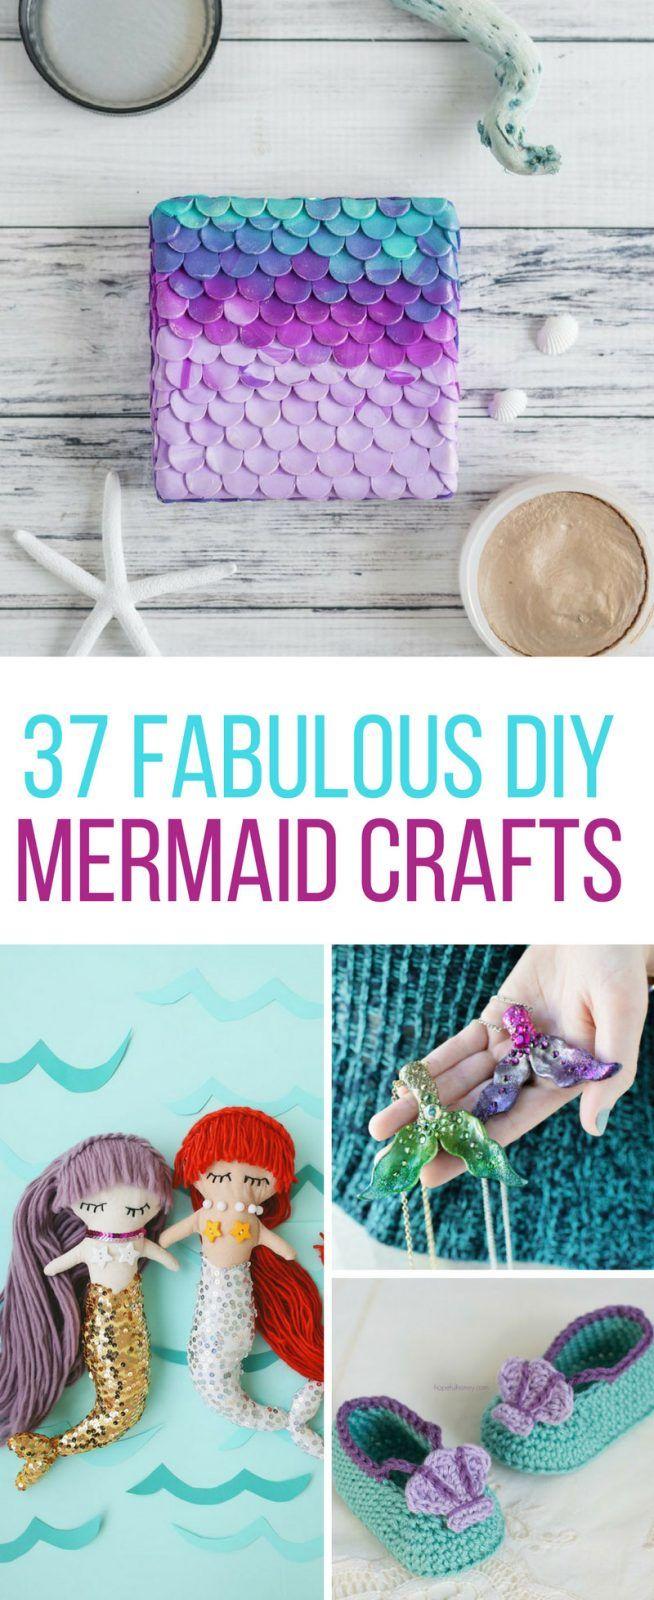 cd7b5672f2936 37 Fabulous DIY Mermaid Crafts to Make You Feel Like You re Under ...